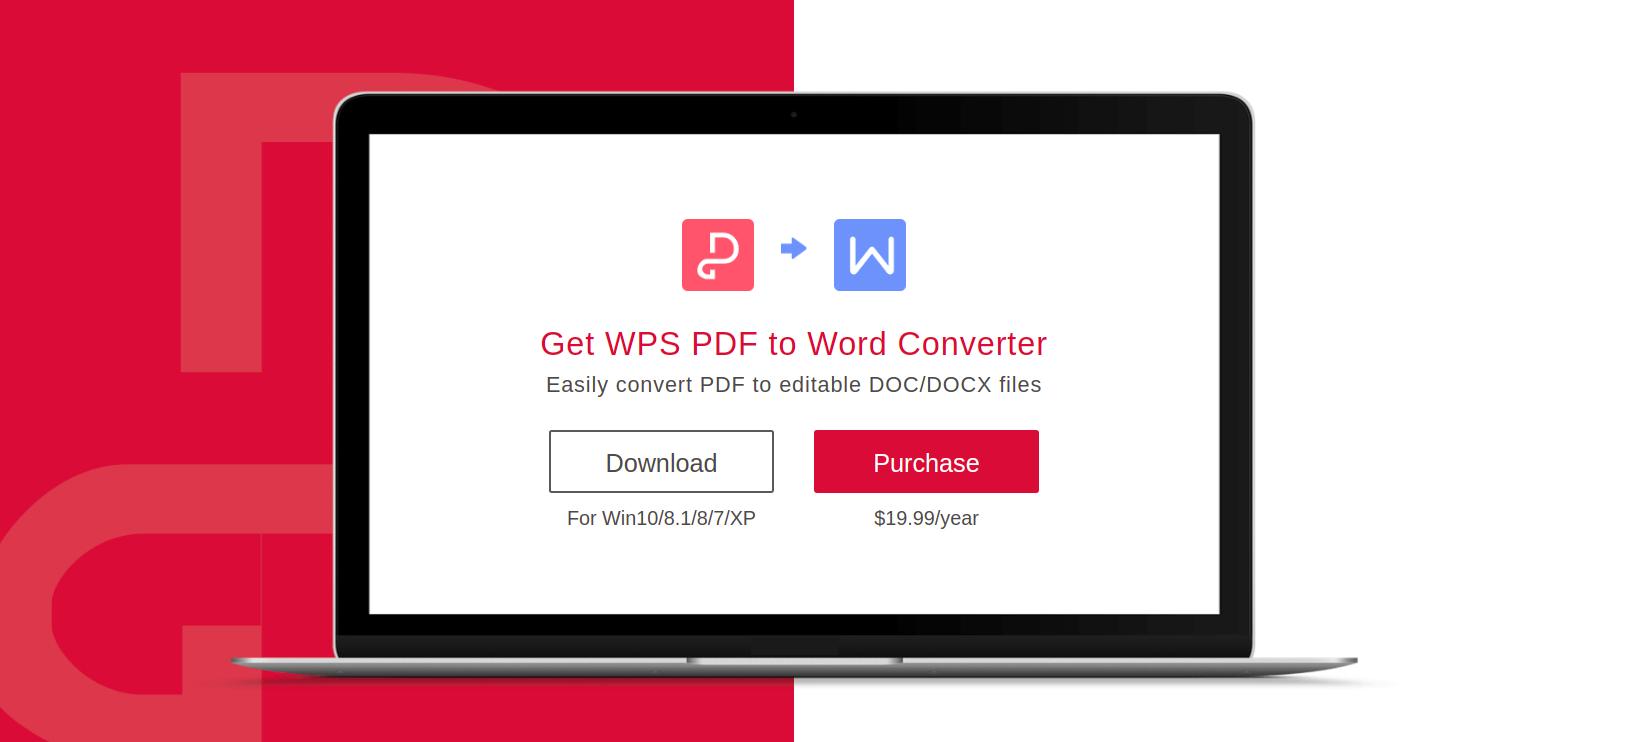 WPS Office PDF ti Word